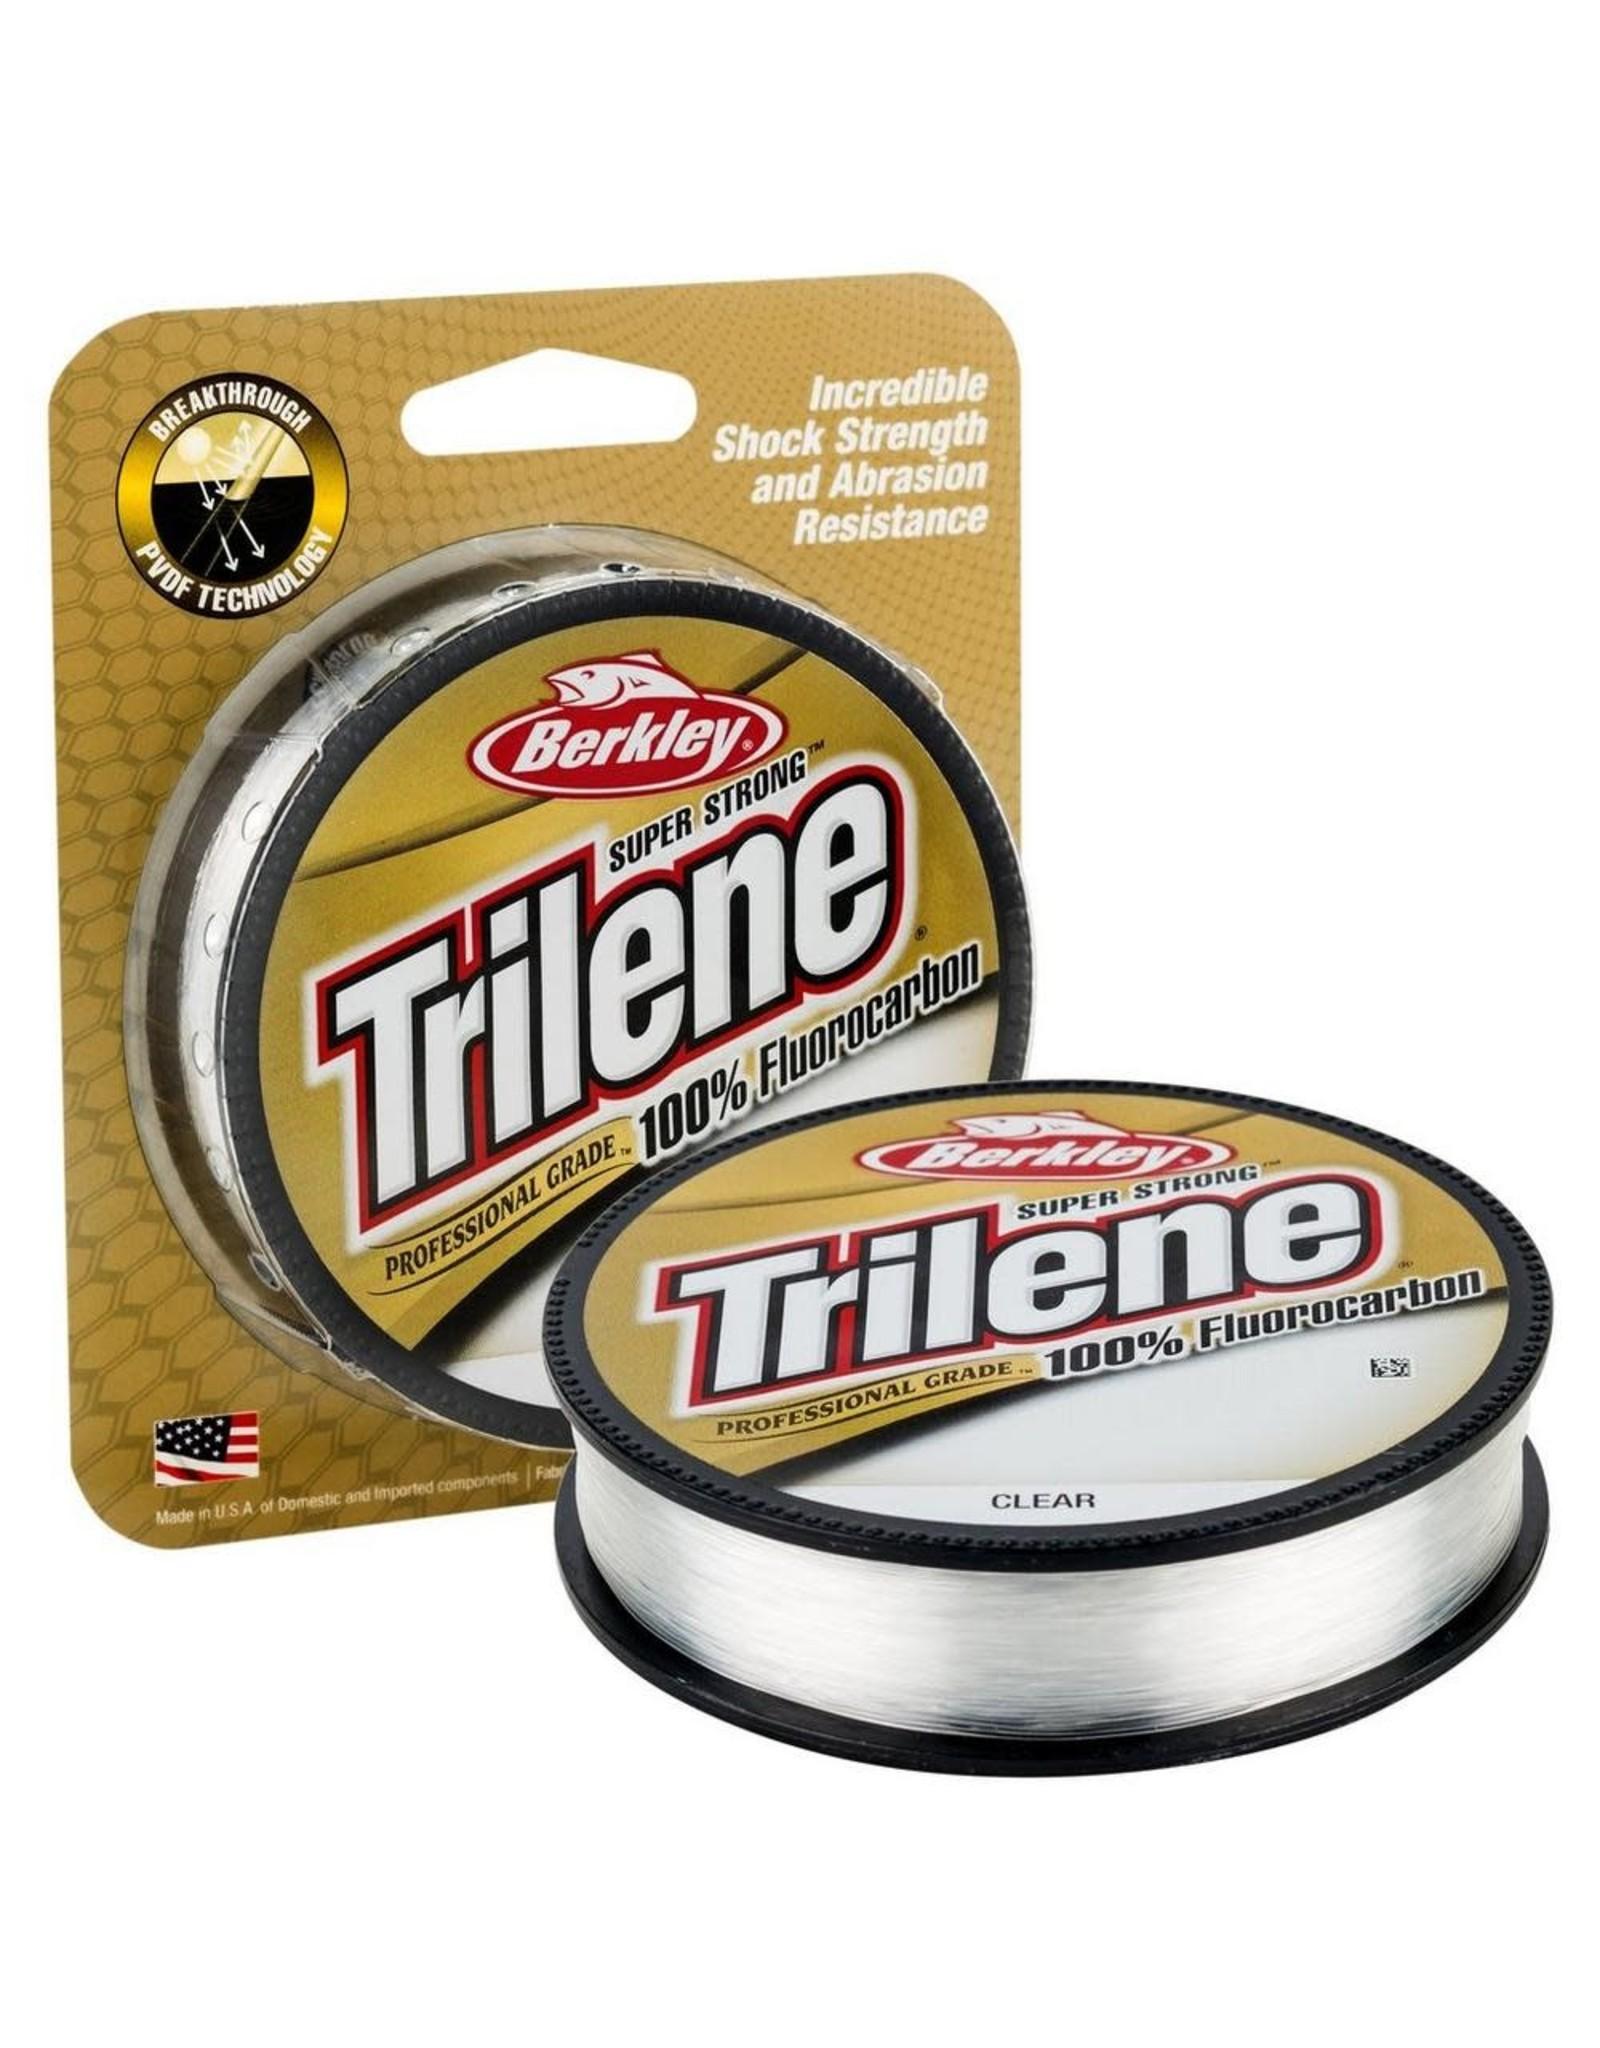 Berkley Fishing Trilene 100% Flurocarbon